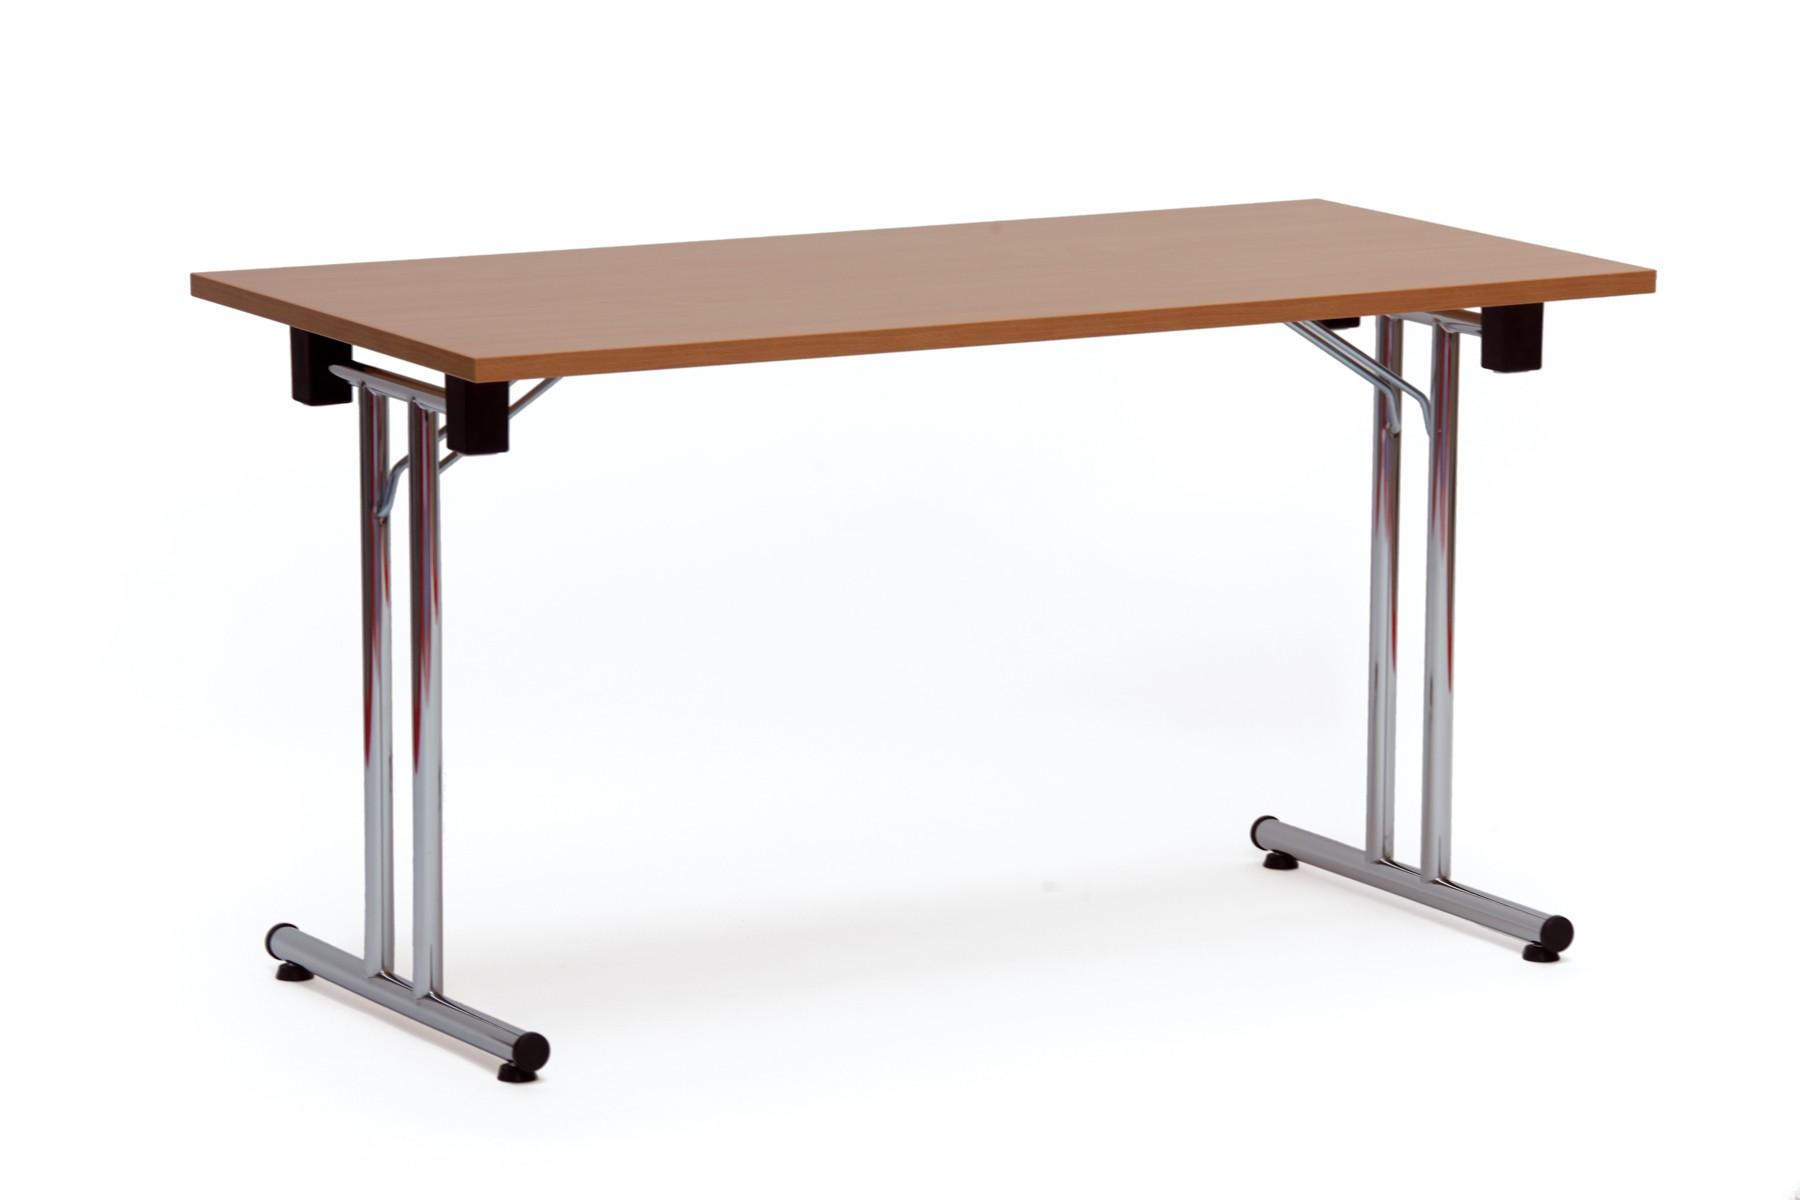 Table pliante empilable komino achat tables de r union 159 00 - Table de collectivite pliante ...